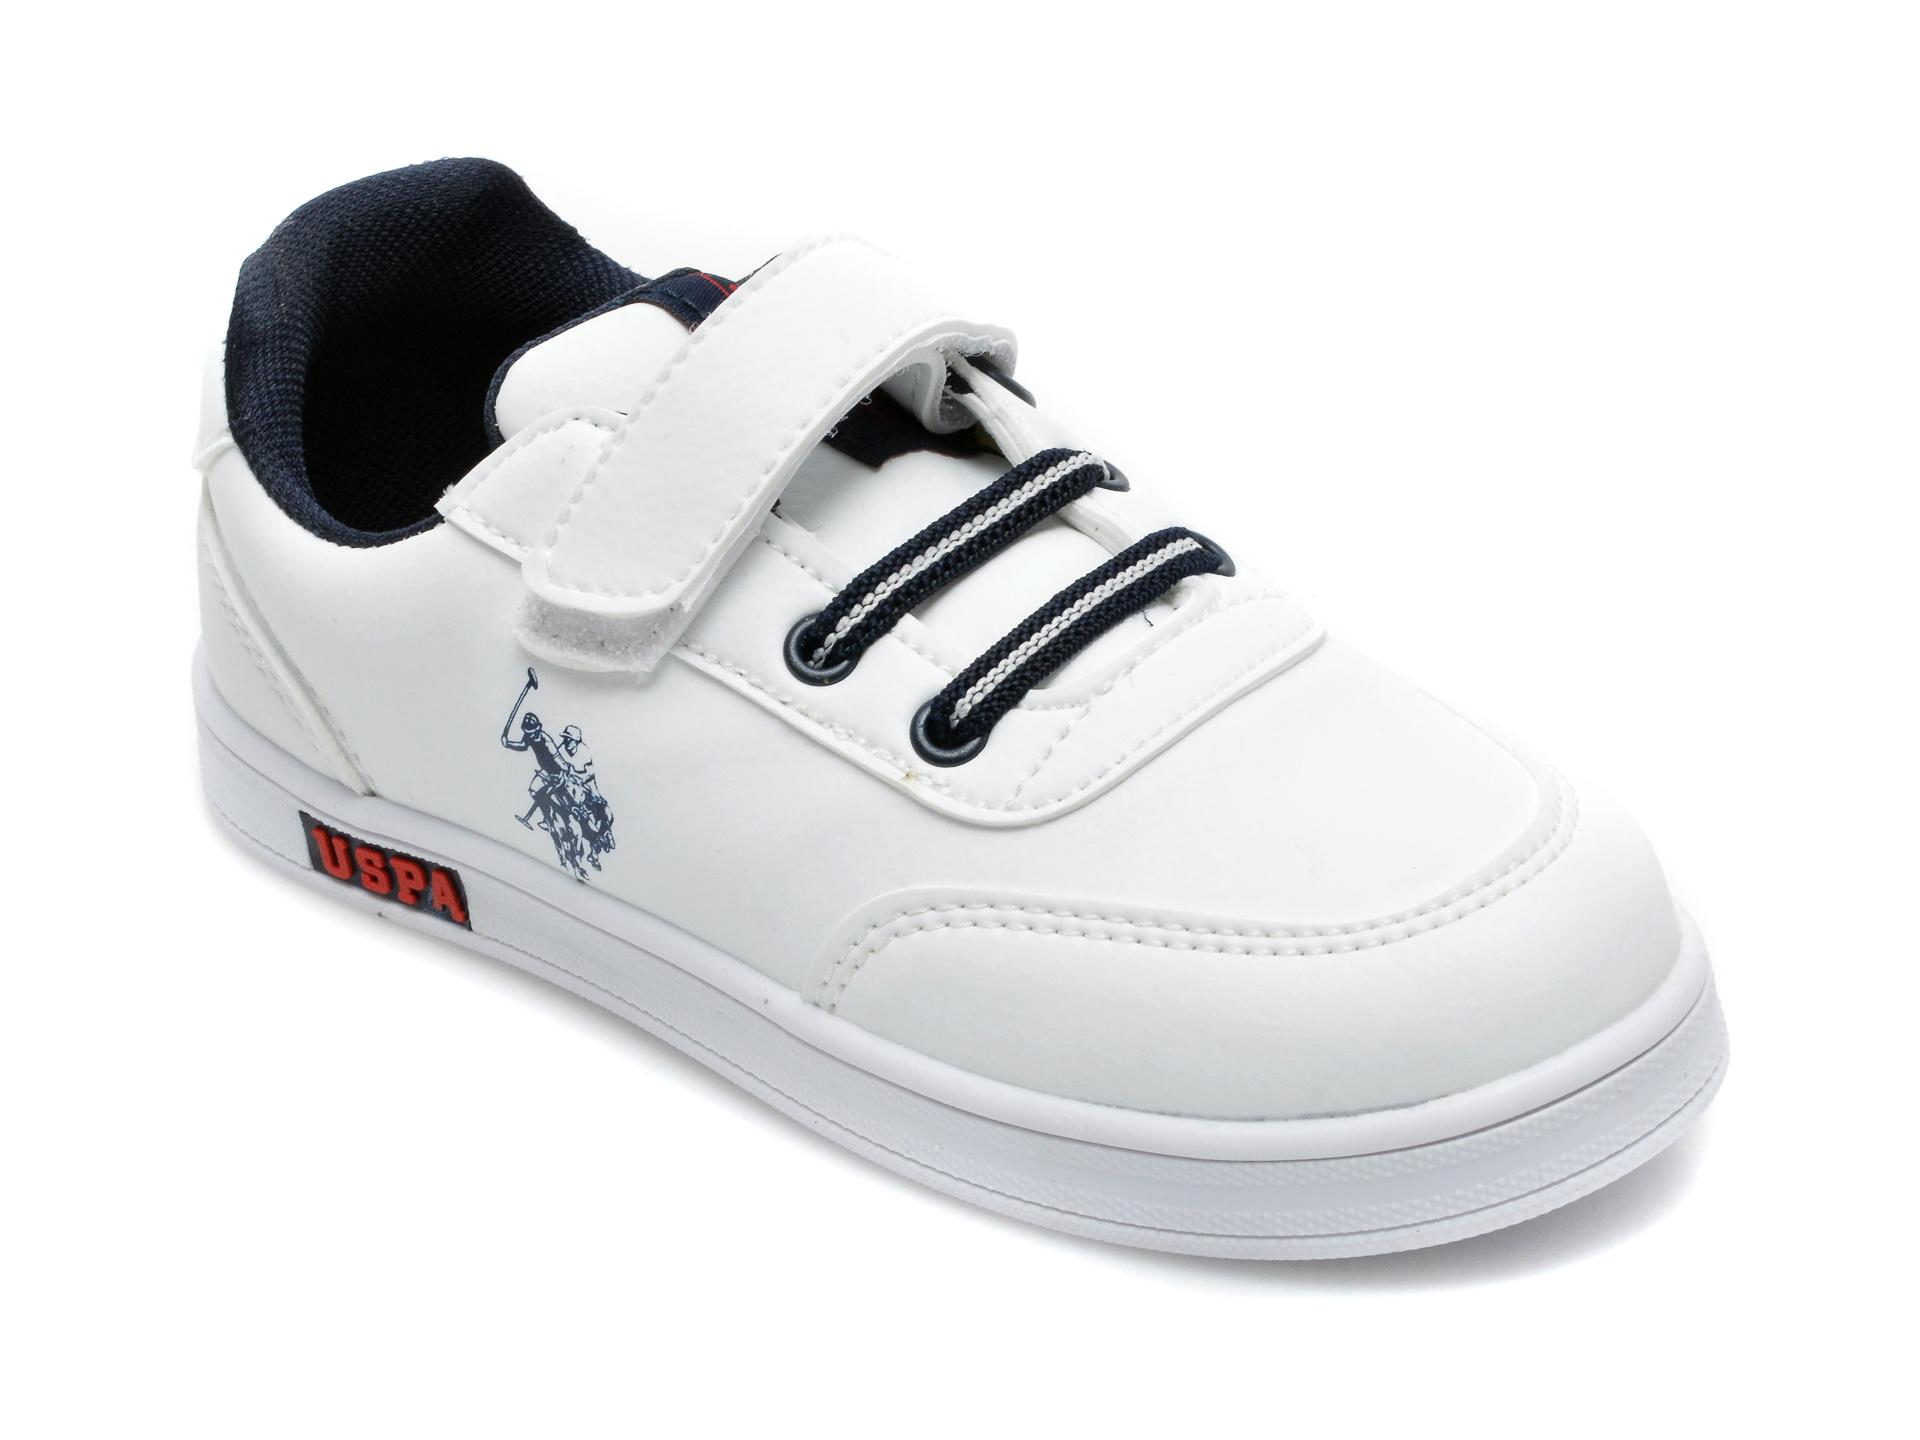 Pantofi sport US POLO ASSN albi, ALEN1FX, din piele ecologica